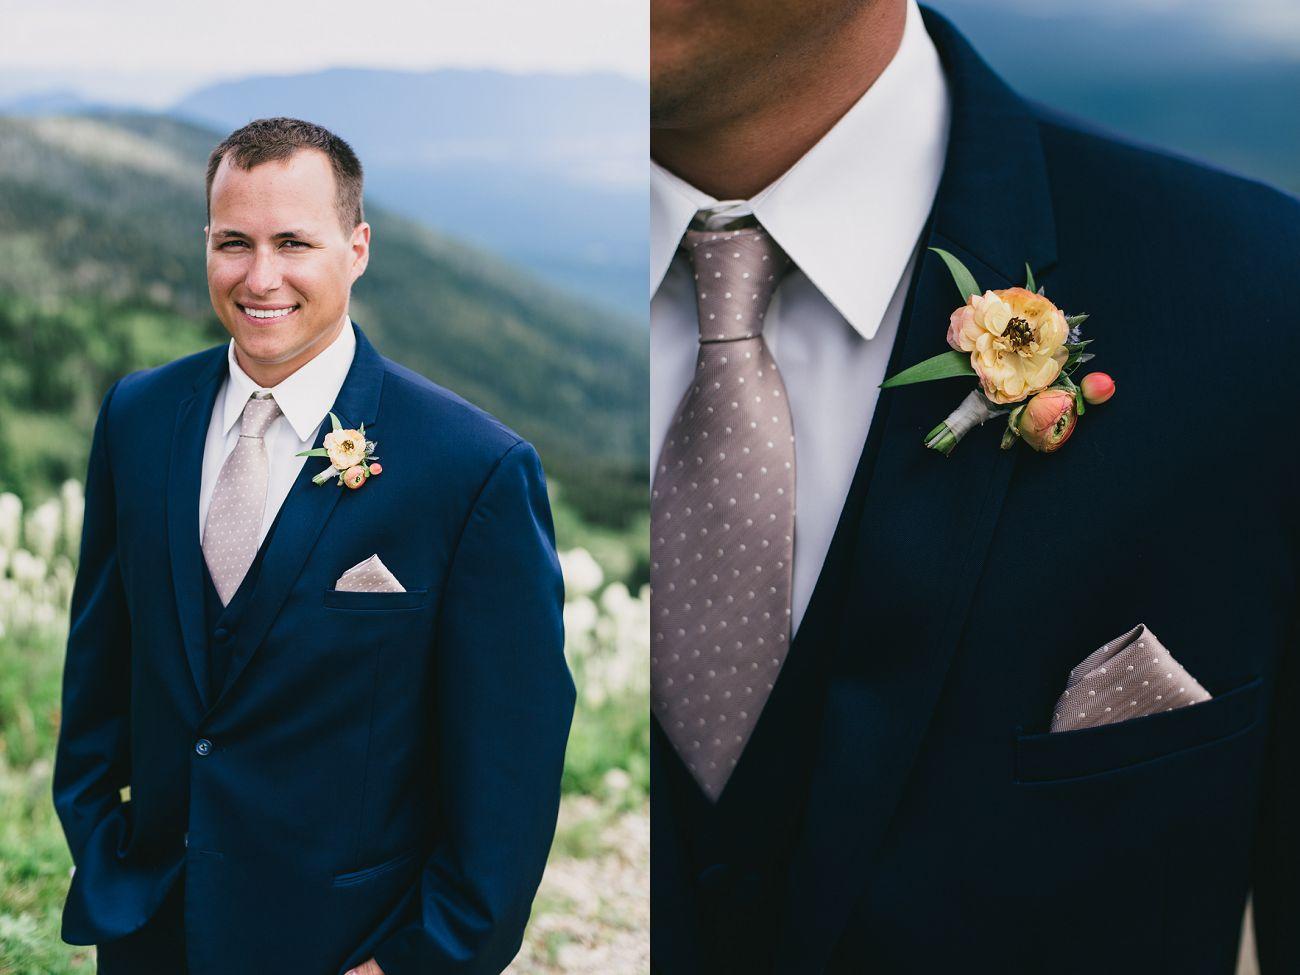 Jennifer_Mooney_Photo_Whitefish_Mountain_Resort_Wedding_00063.jpg